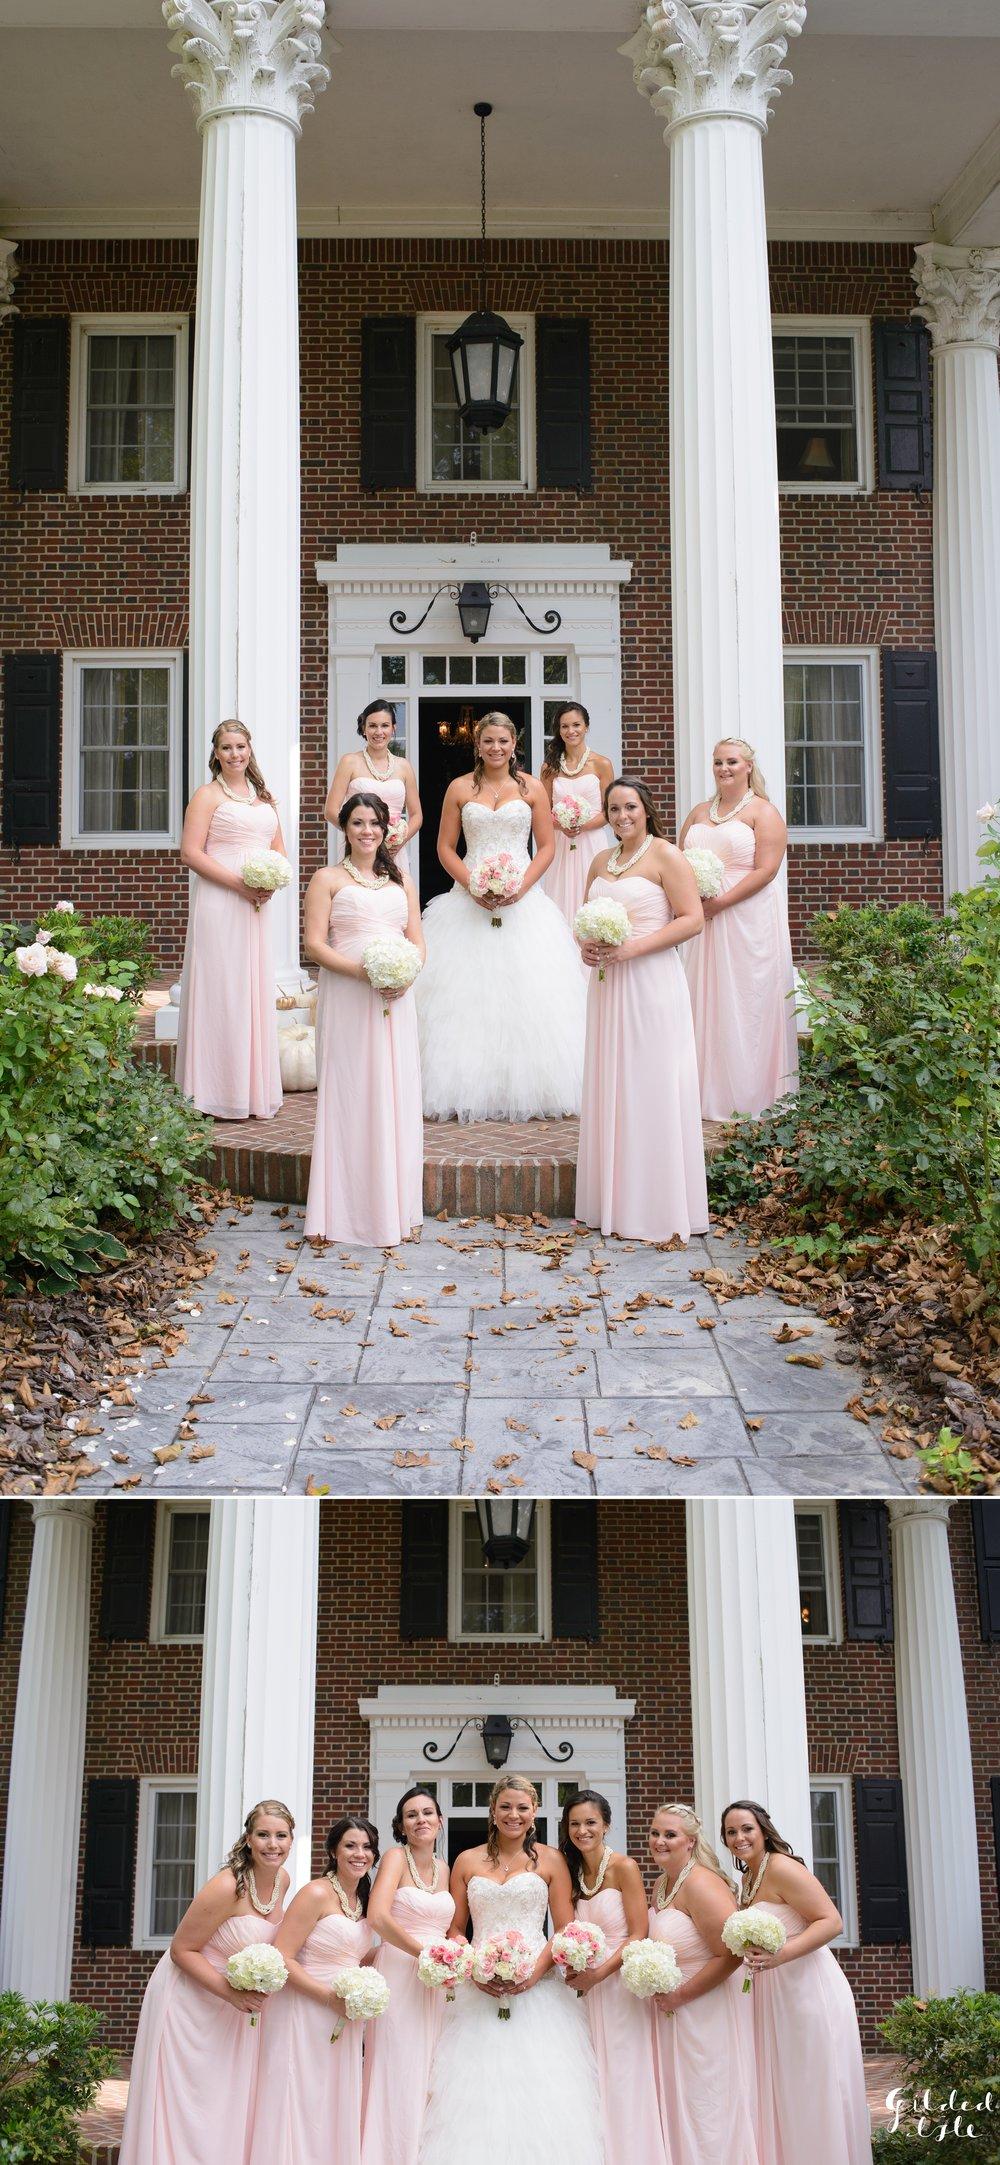 wedding-delaware-sunnybrae-mansion-salisbury-maryland-photo 8.jpg